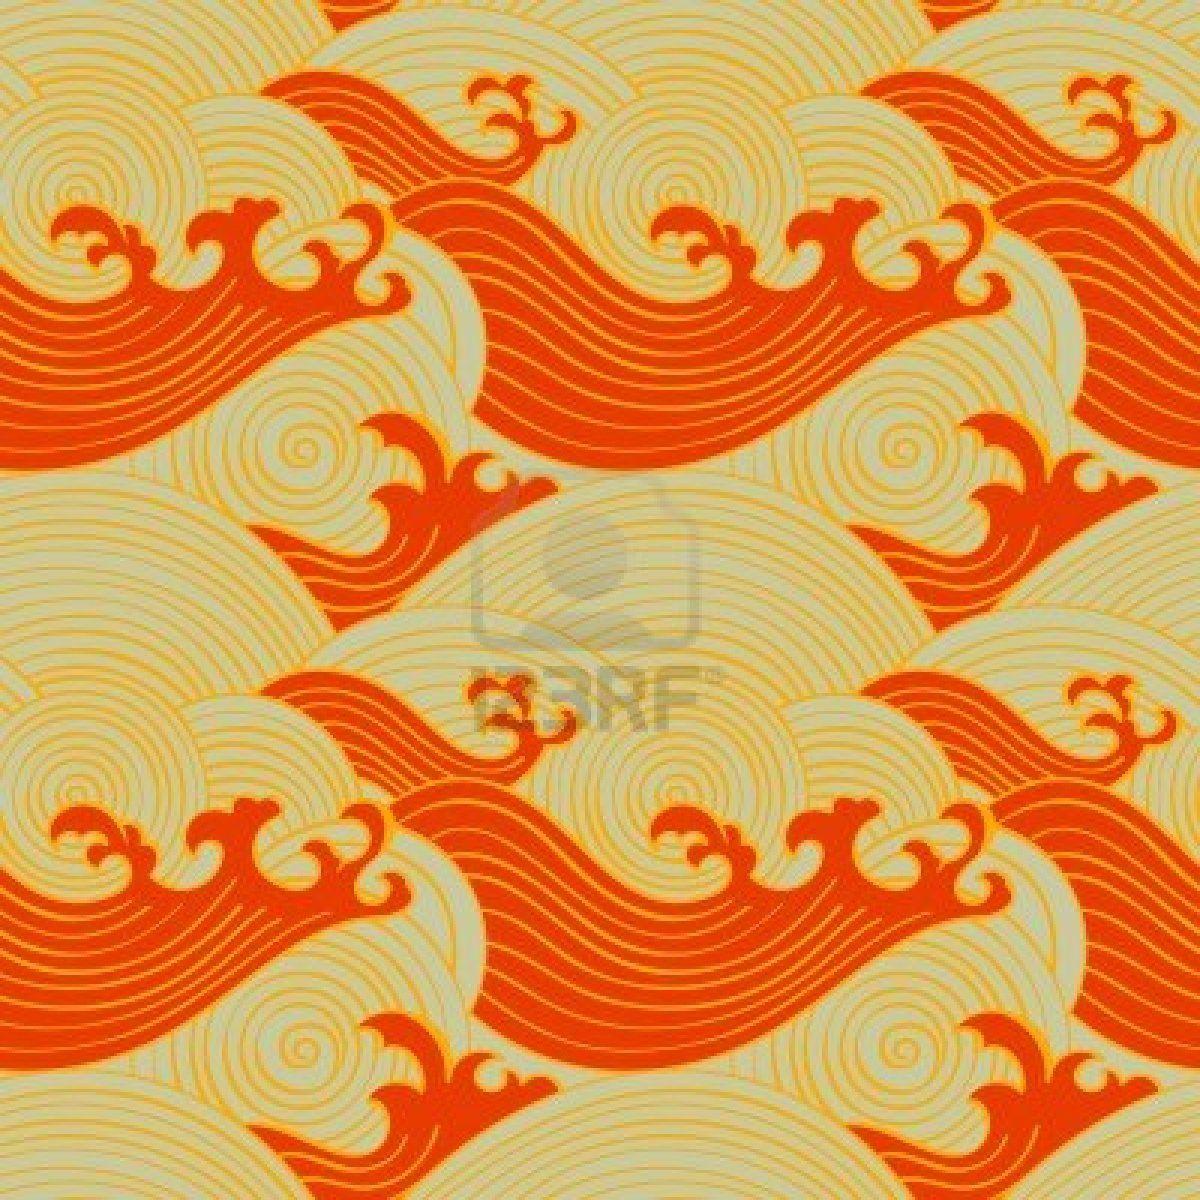 Stock Photo Japanische Muster Muster Illustration Und Warme Farben